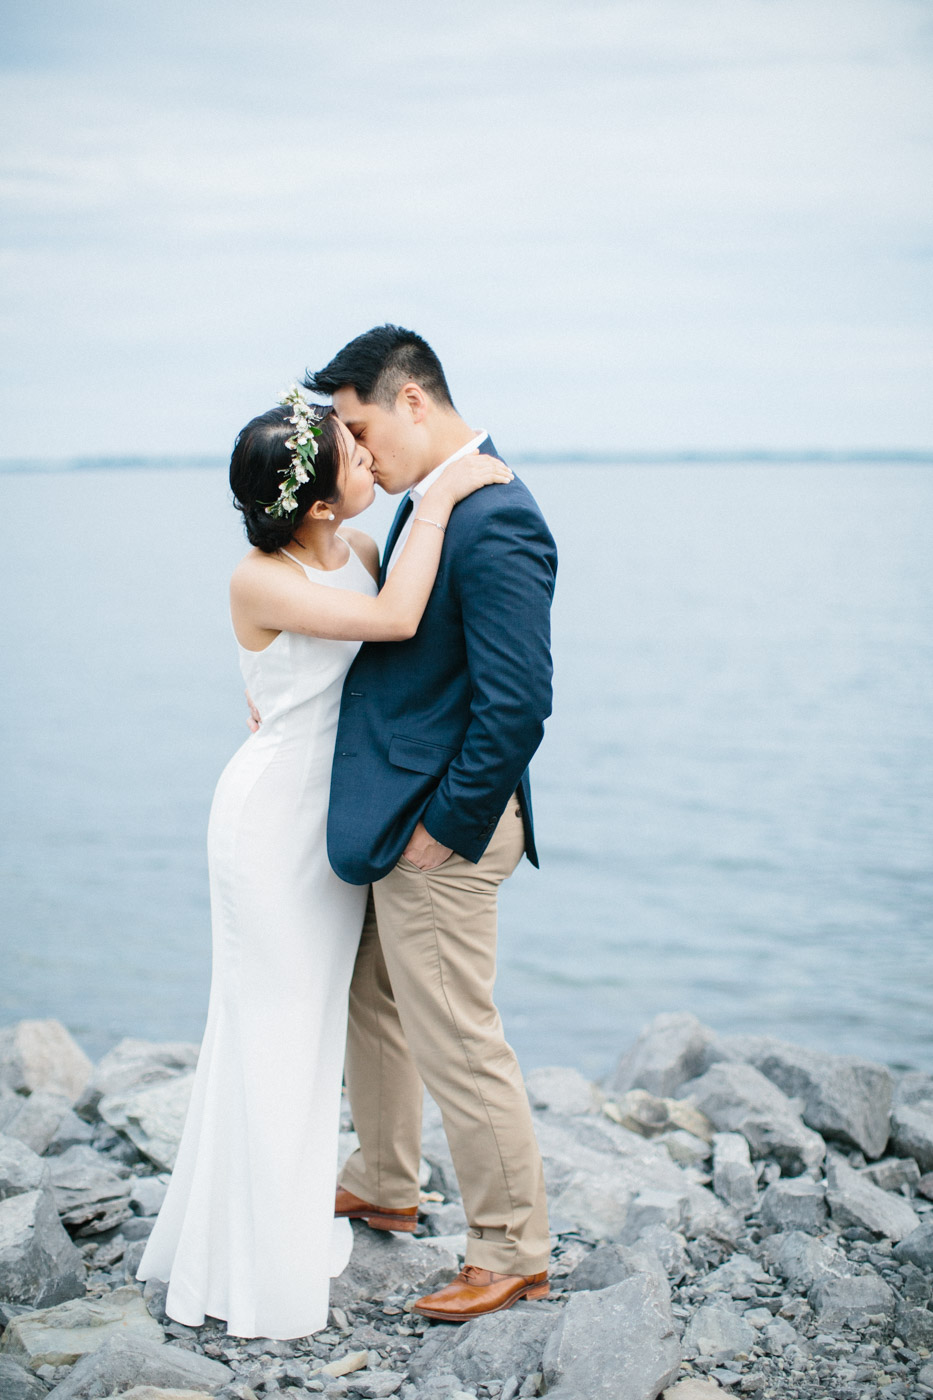 toronto_wedding_photographer_fine_art_documentary 2017-166.jpg